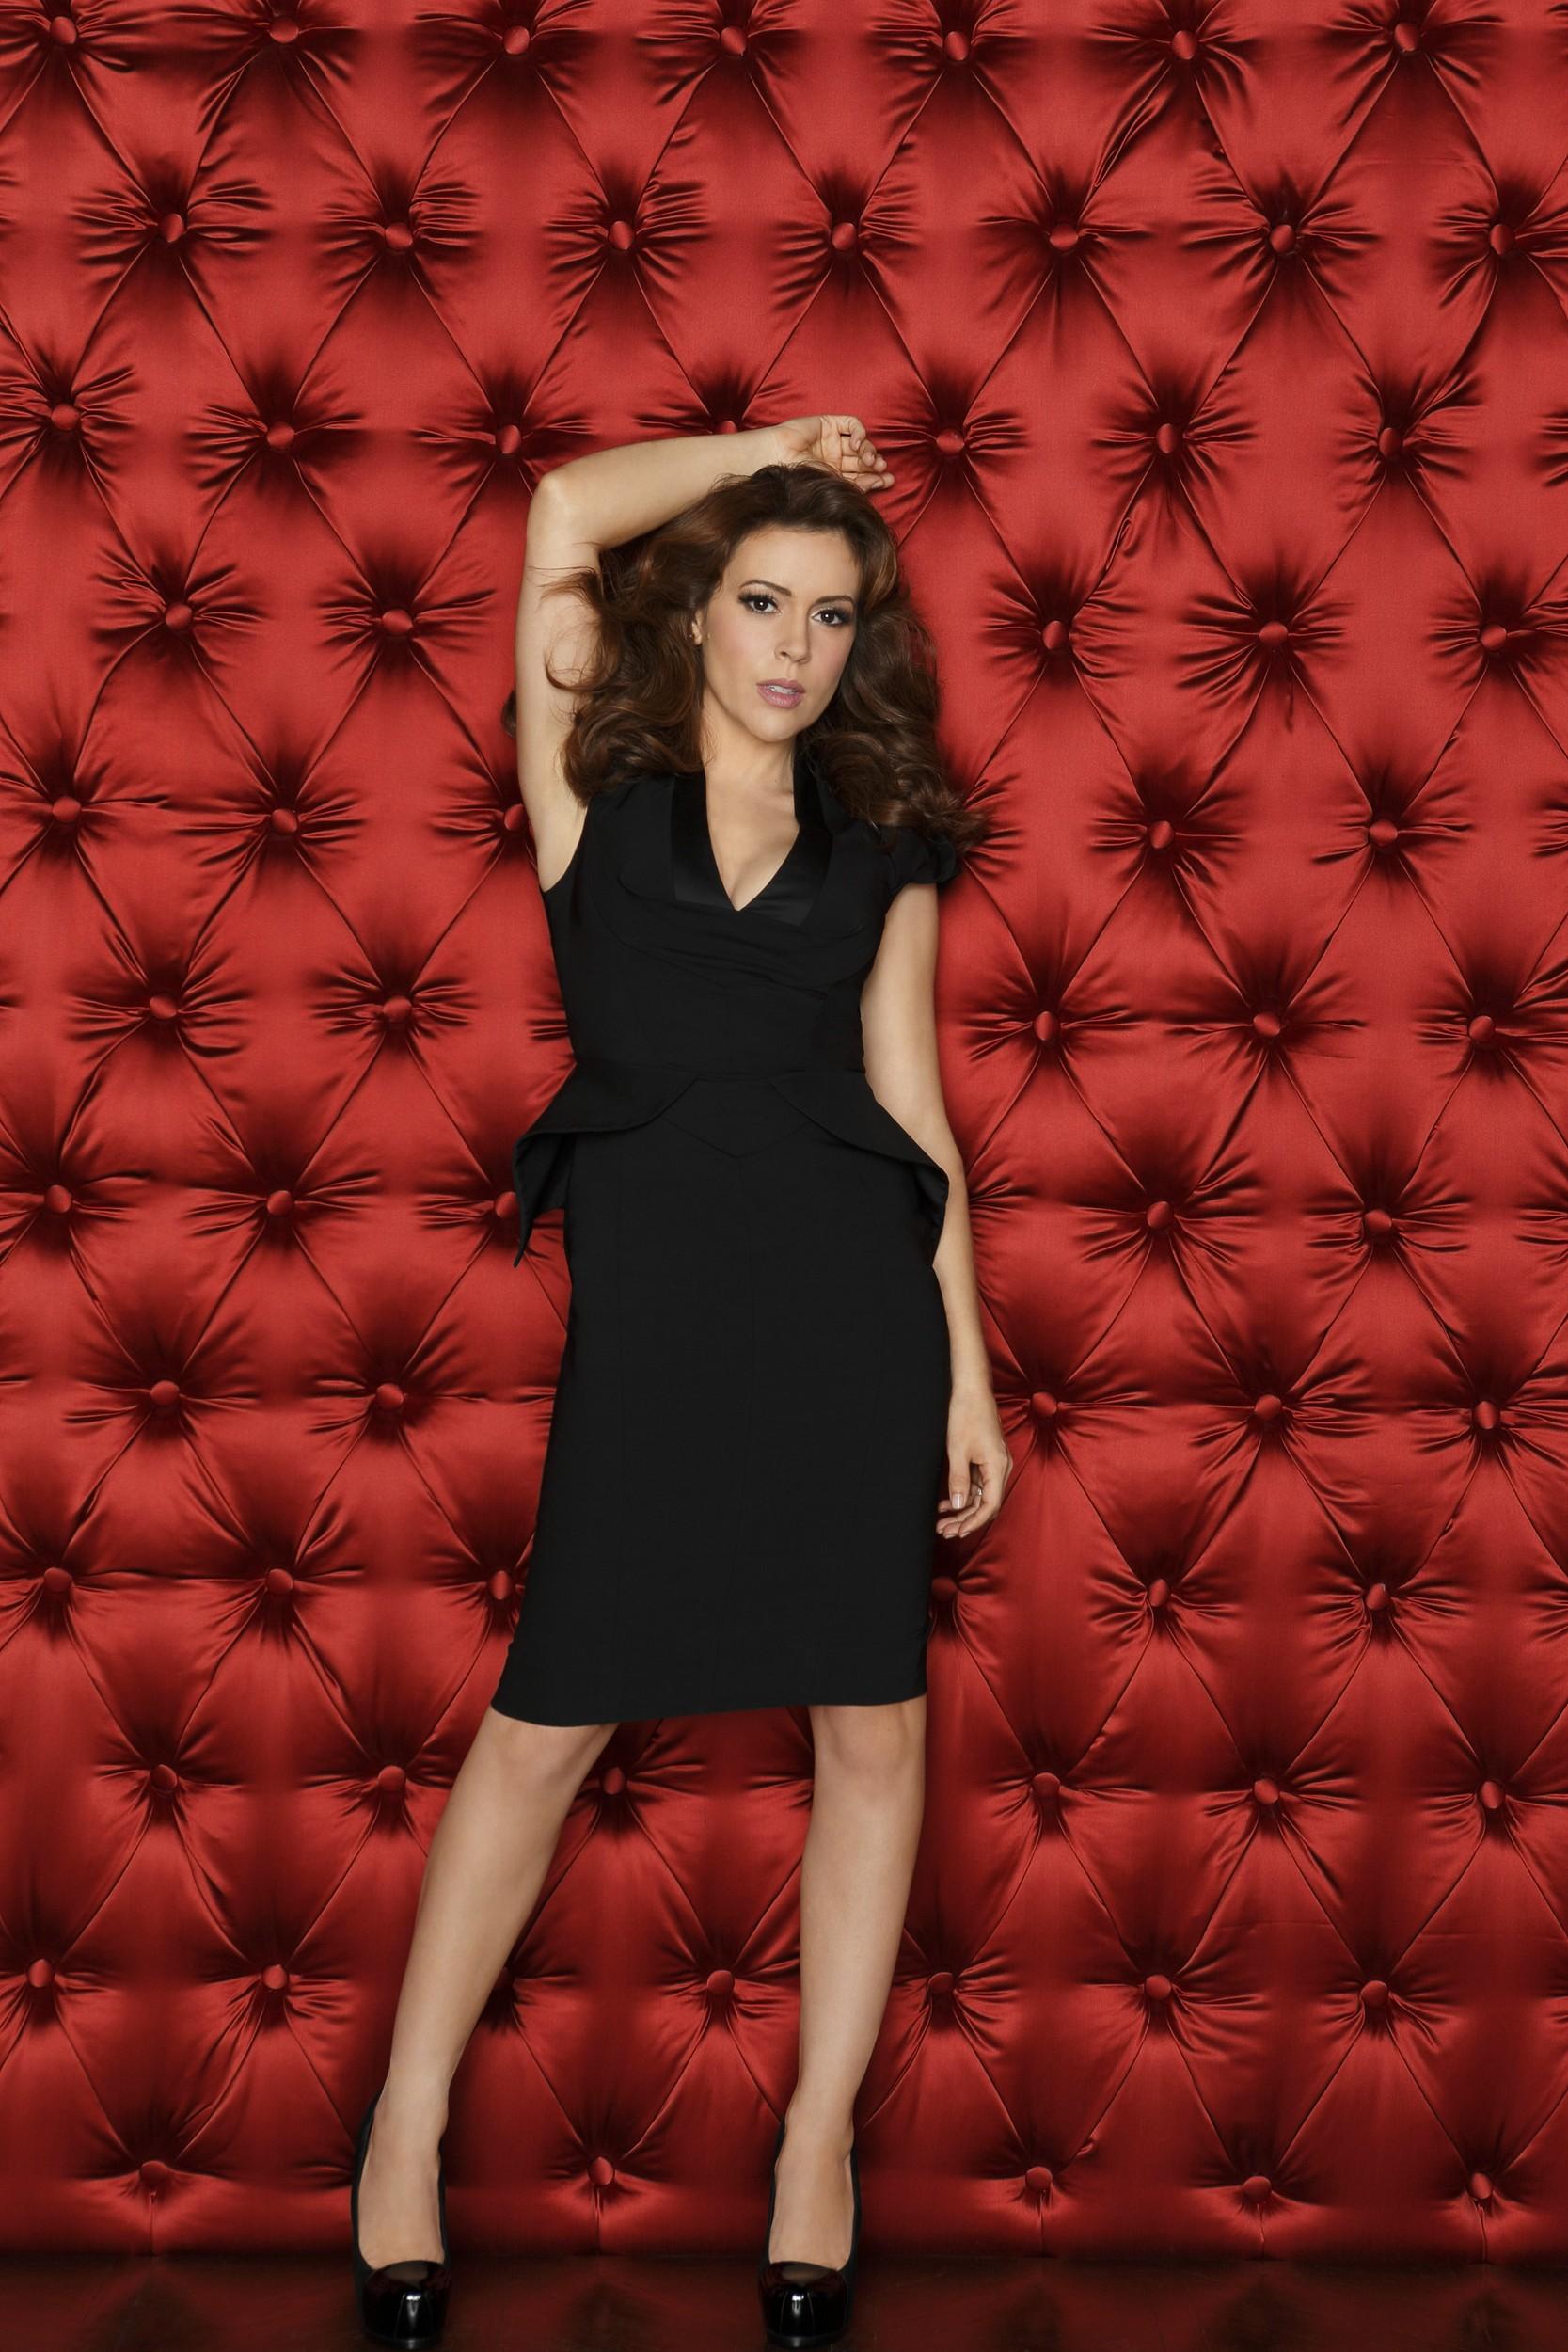 Alyssa Milano etcMistresses S01 - 2013 HD 720